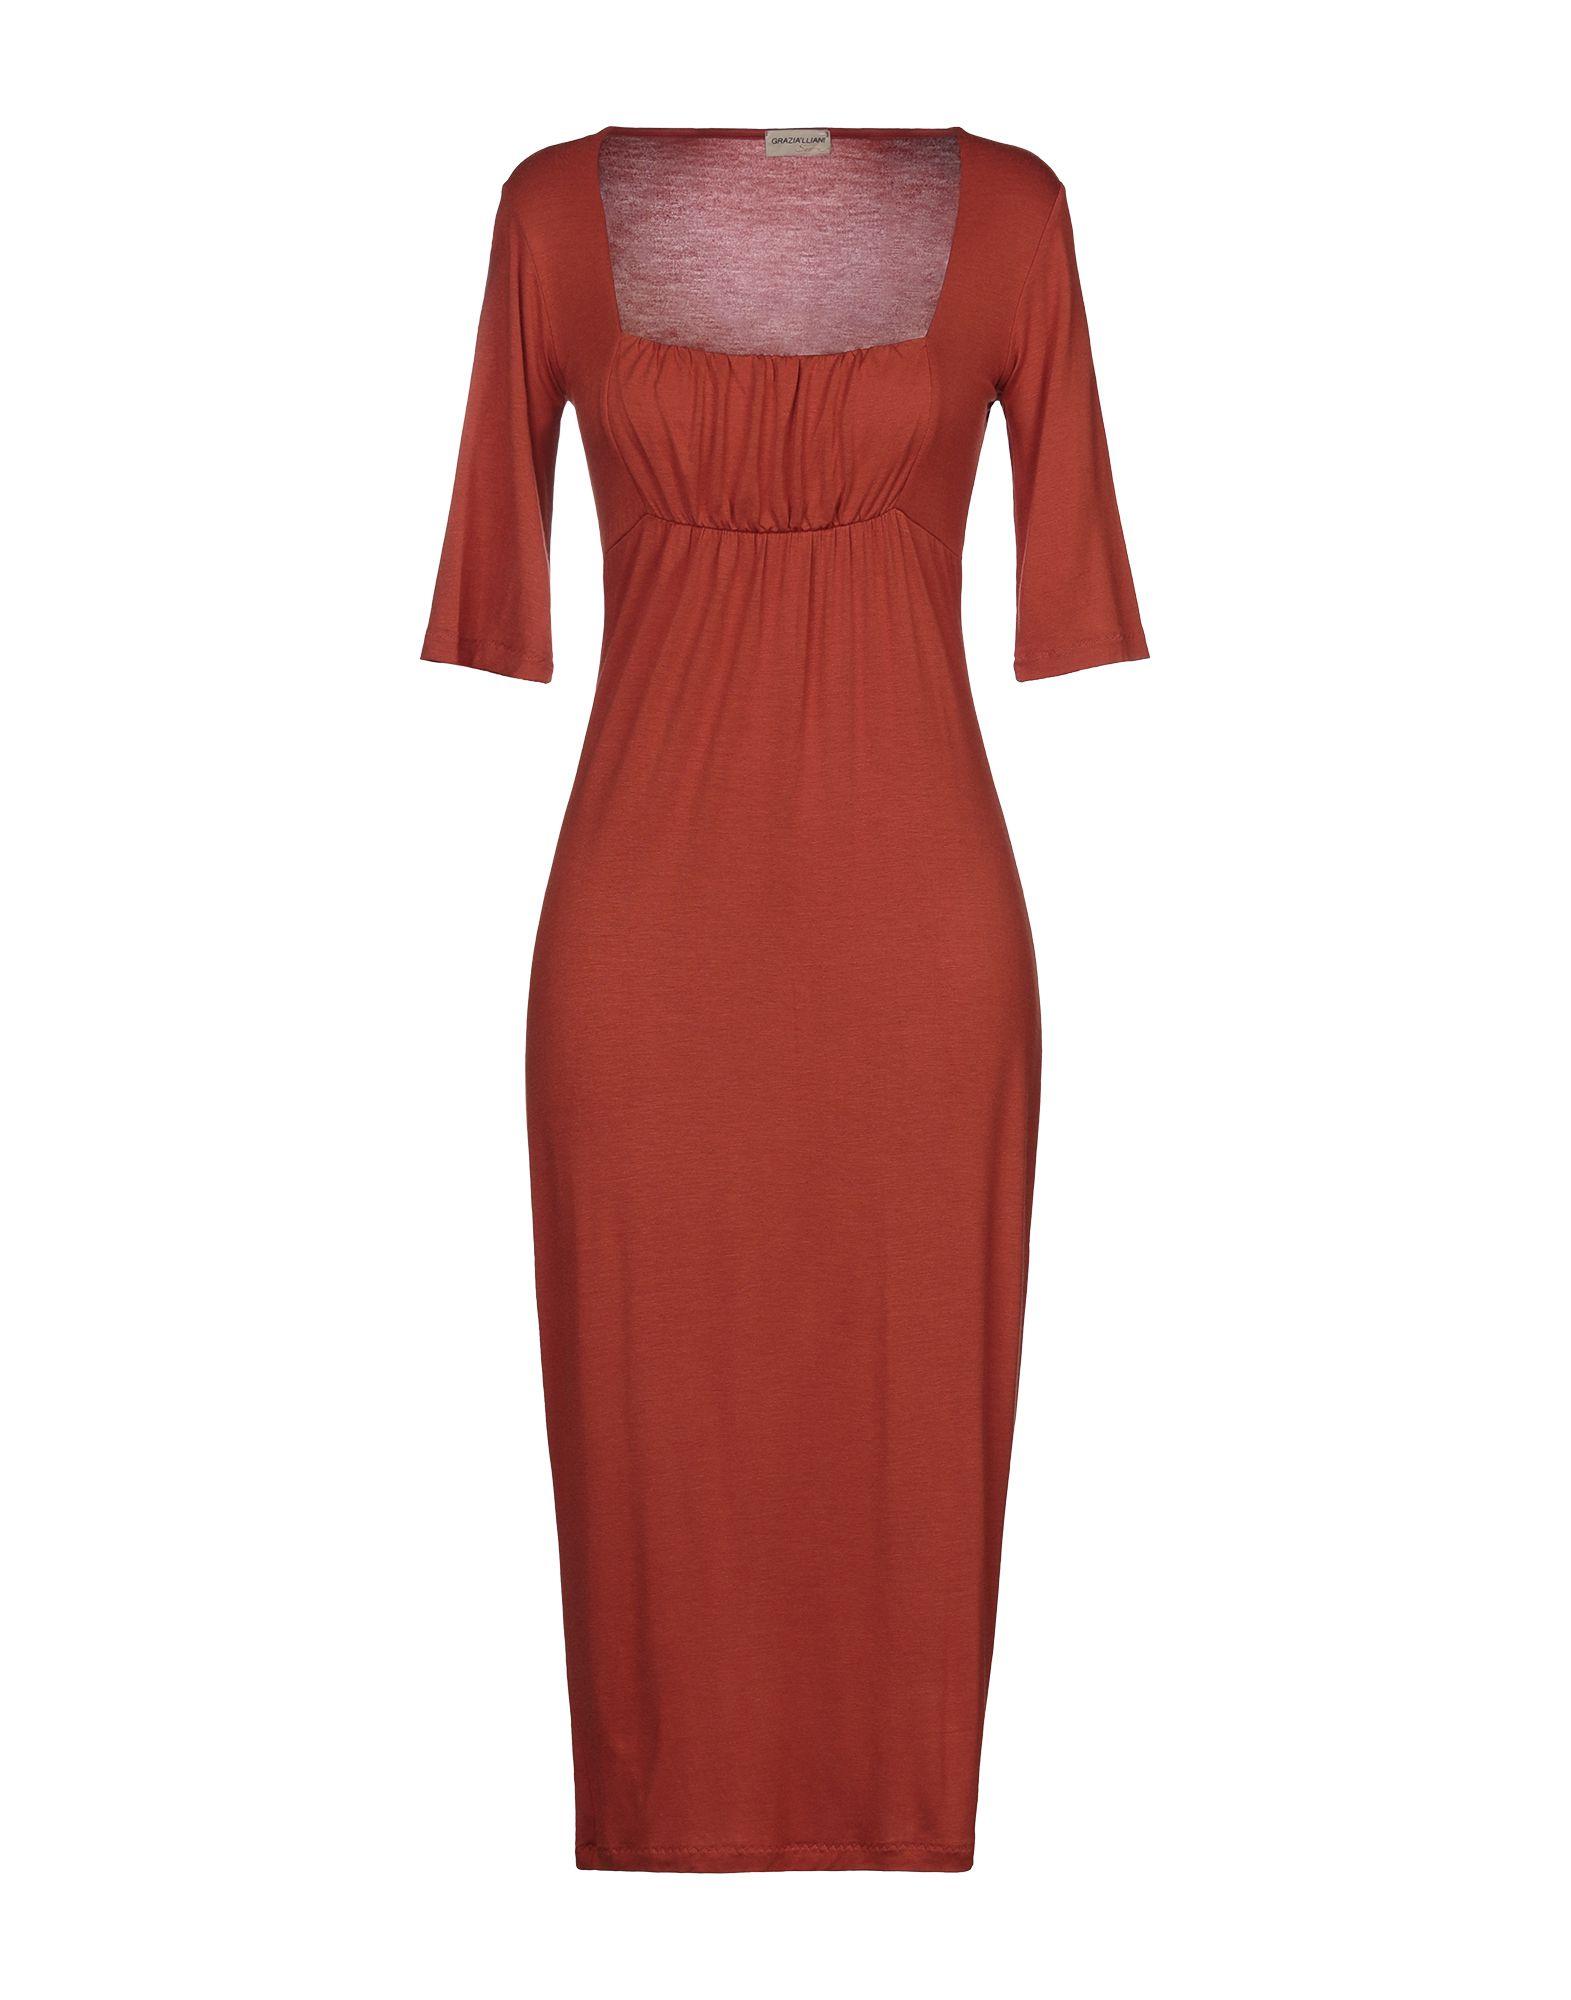 GRAZIA'LLIANI SOON Платье длиной 3/4 centoquattro платье длиной 3 4